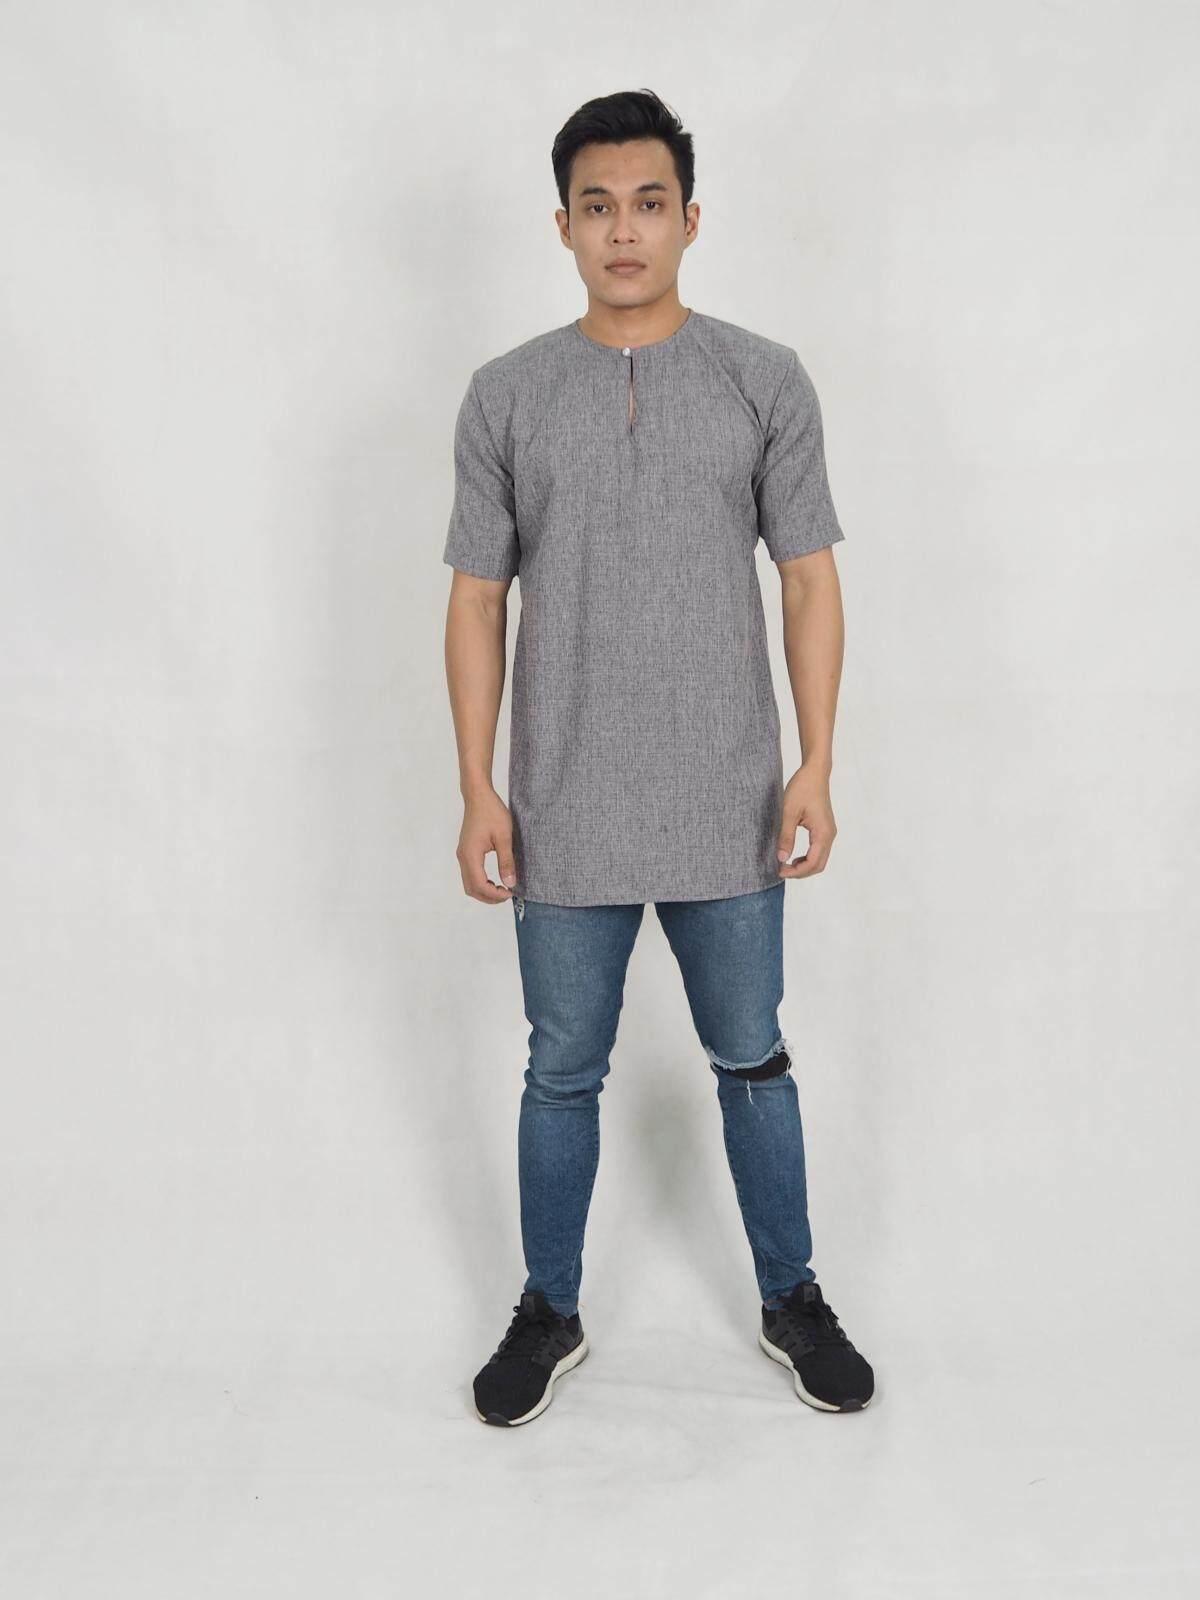 Muslim Men Moden Muslimin Half sleeves cotton Linen shirt Kurta / Hafiz Short sleeve Man Top / Moden men Kurta Raya 2021 / Ready Stock / Murah / Ship from Malaysia / Hot Product